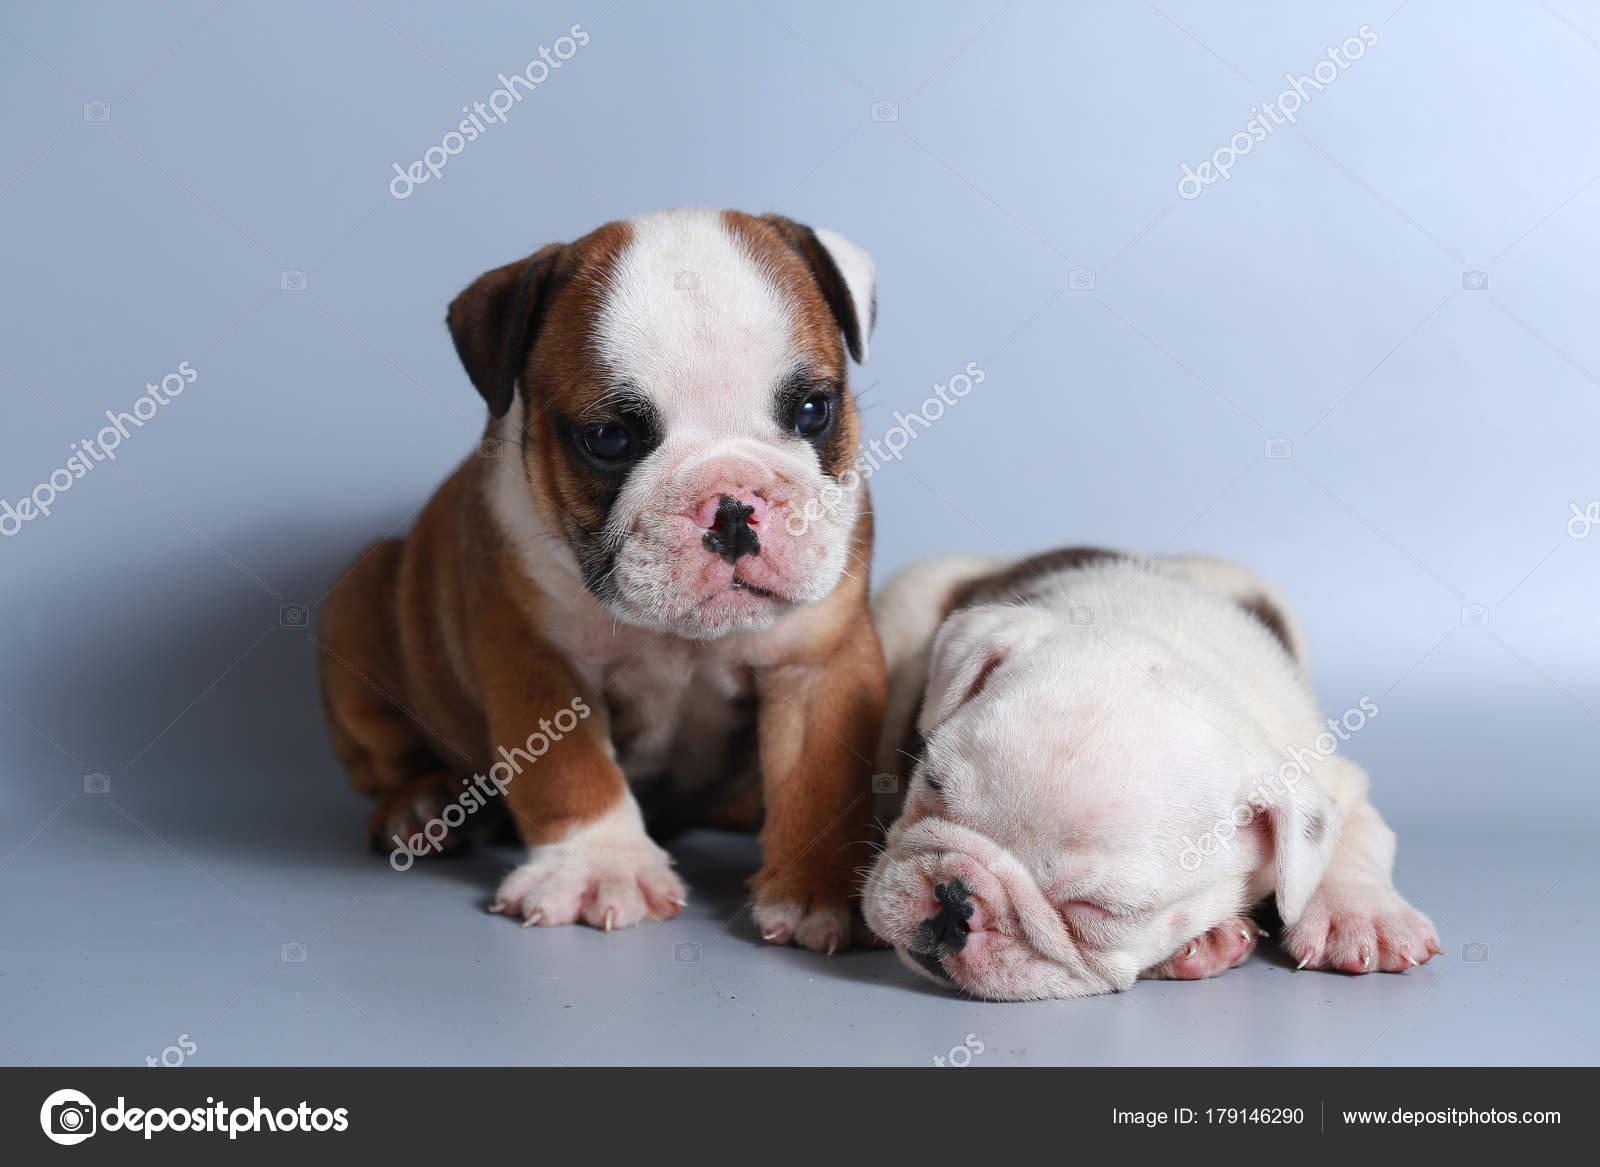 Month Purebred English Bulldog Puppy Gray Screen Stock Photo C S Thanawathreborn Gmail Com 179146290